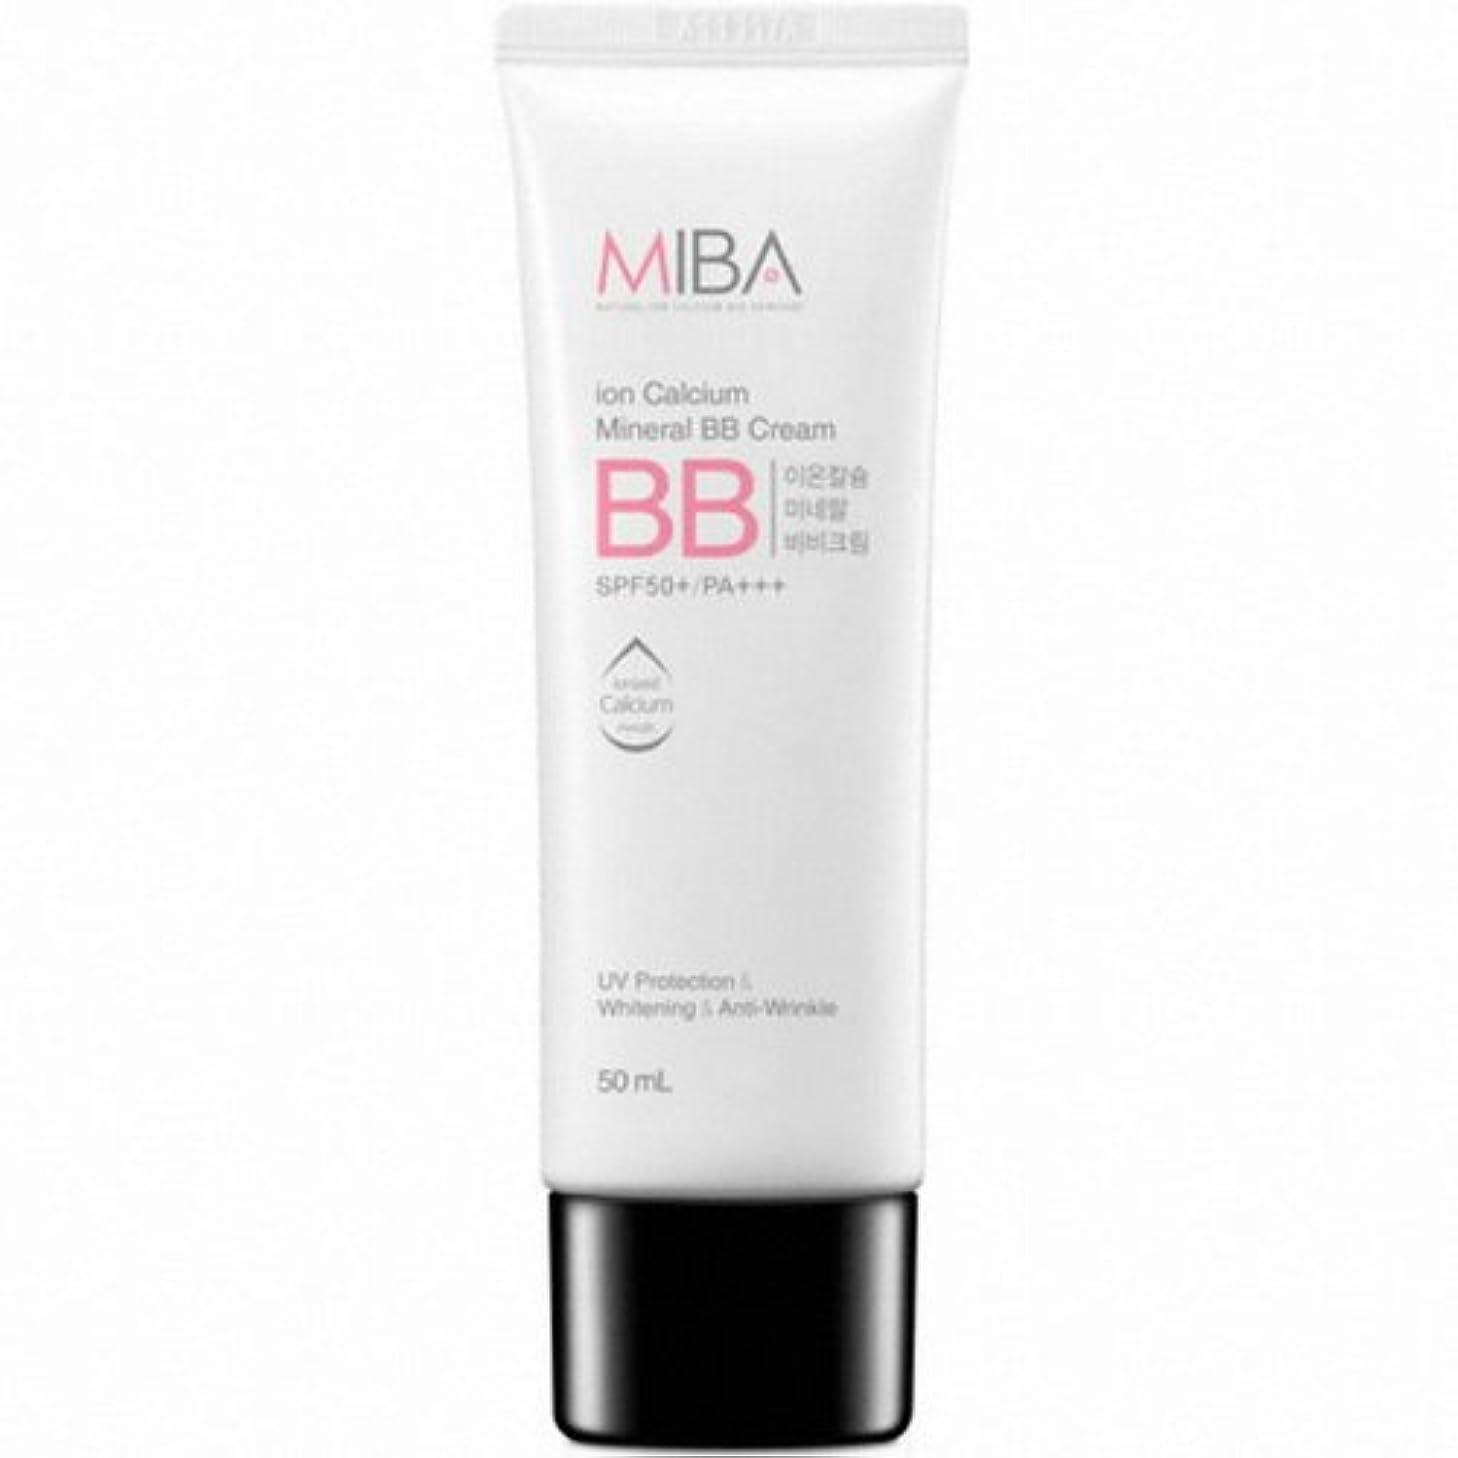 MINERALBIO (ミネラルバイオ) ミバ イオン カルシウム ミネラル ビビクリーム / MIBA Ion Calcium Mineral BB Cream (50ml) [並行輸入品]